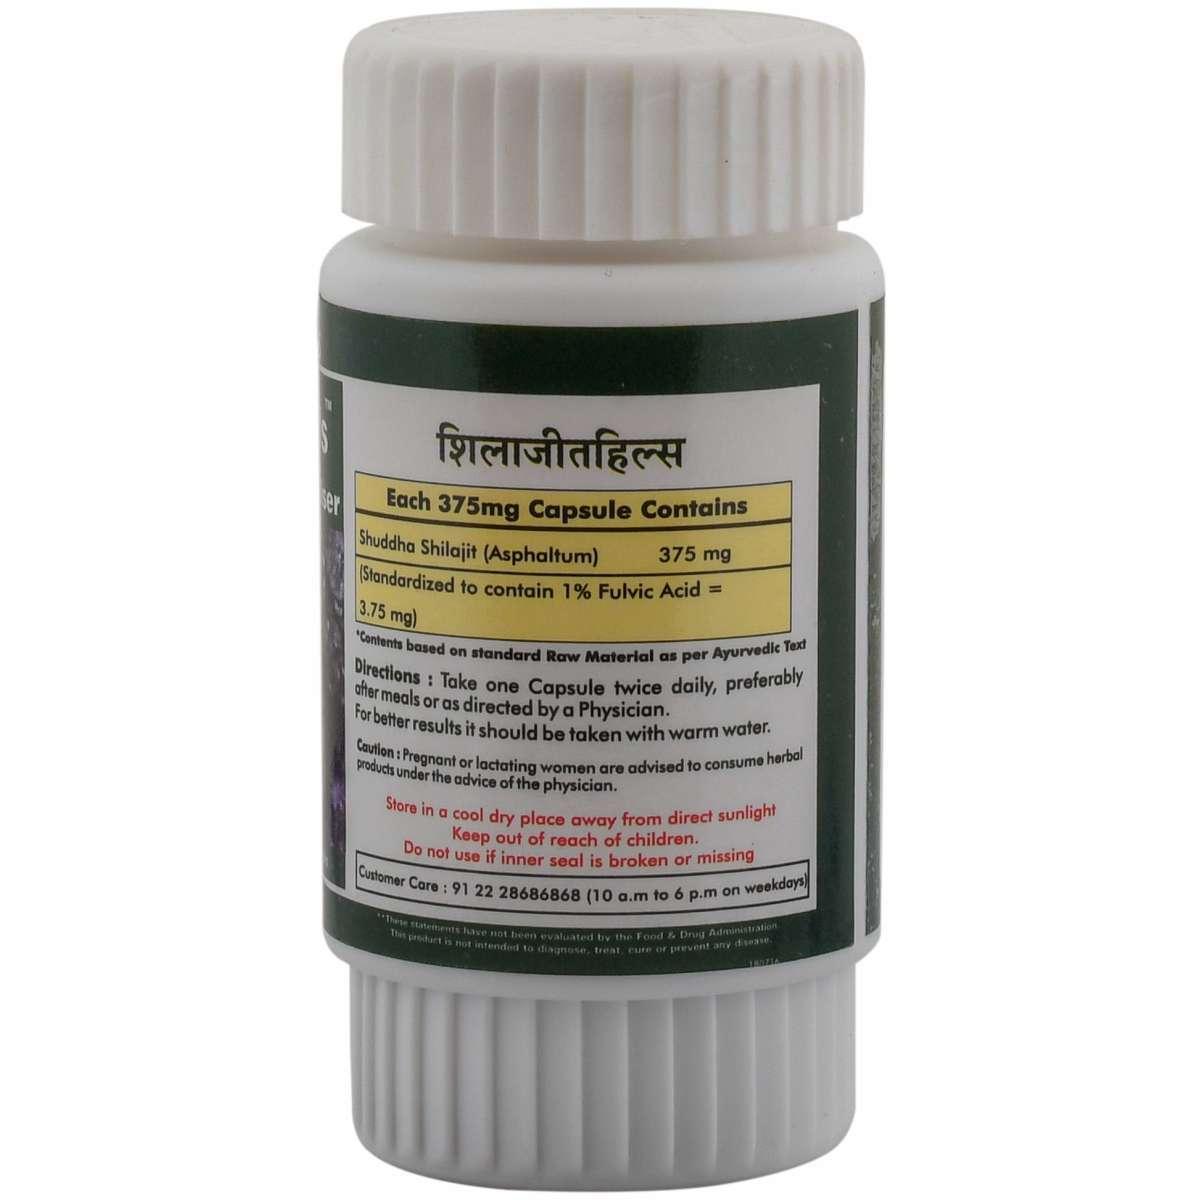 Ayurvedic Medicines for Strength and Stamina - Shilajit 60 Capsule